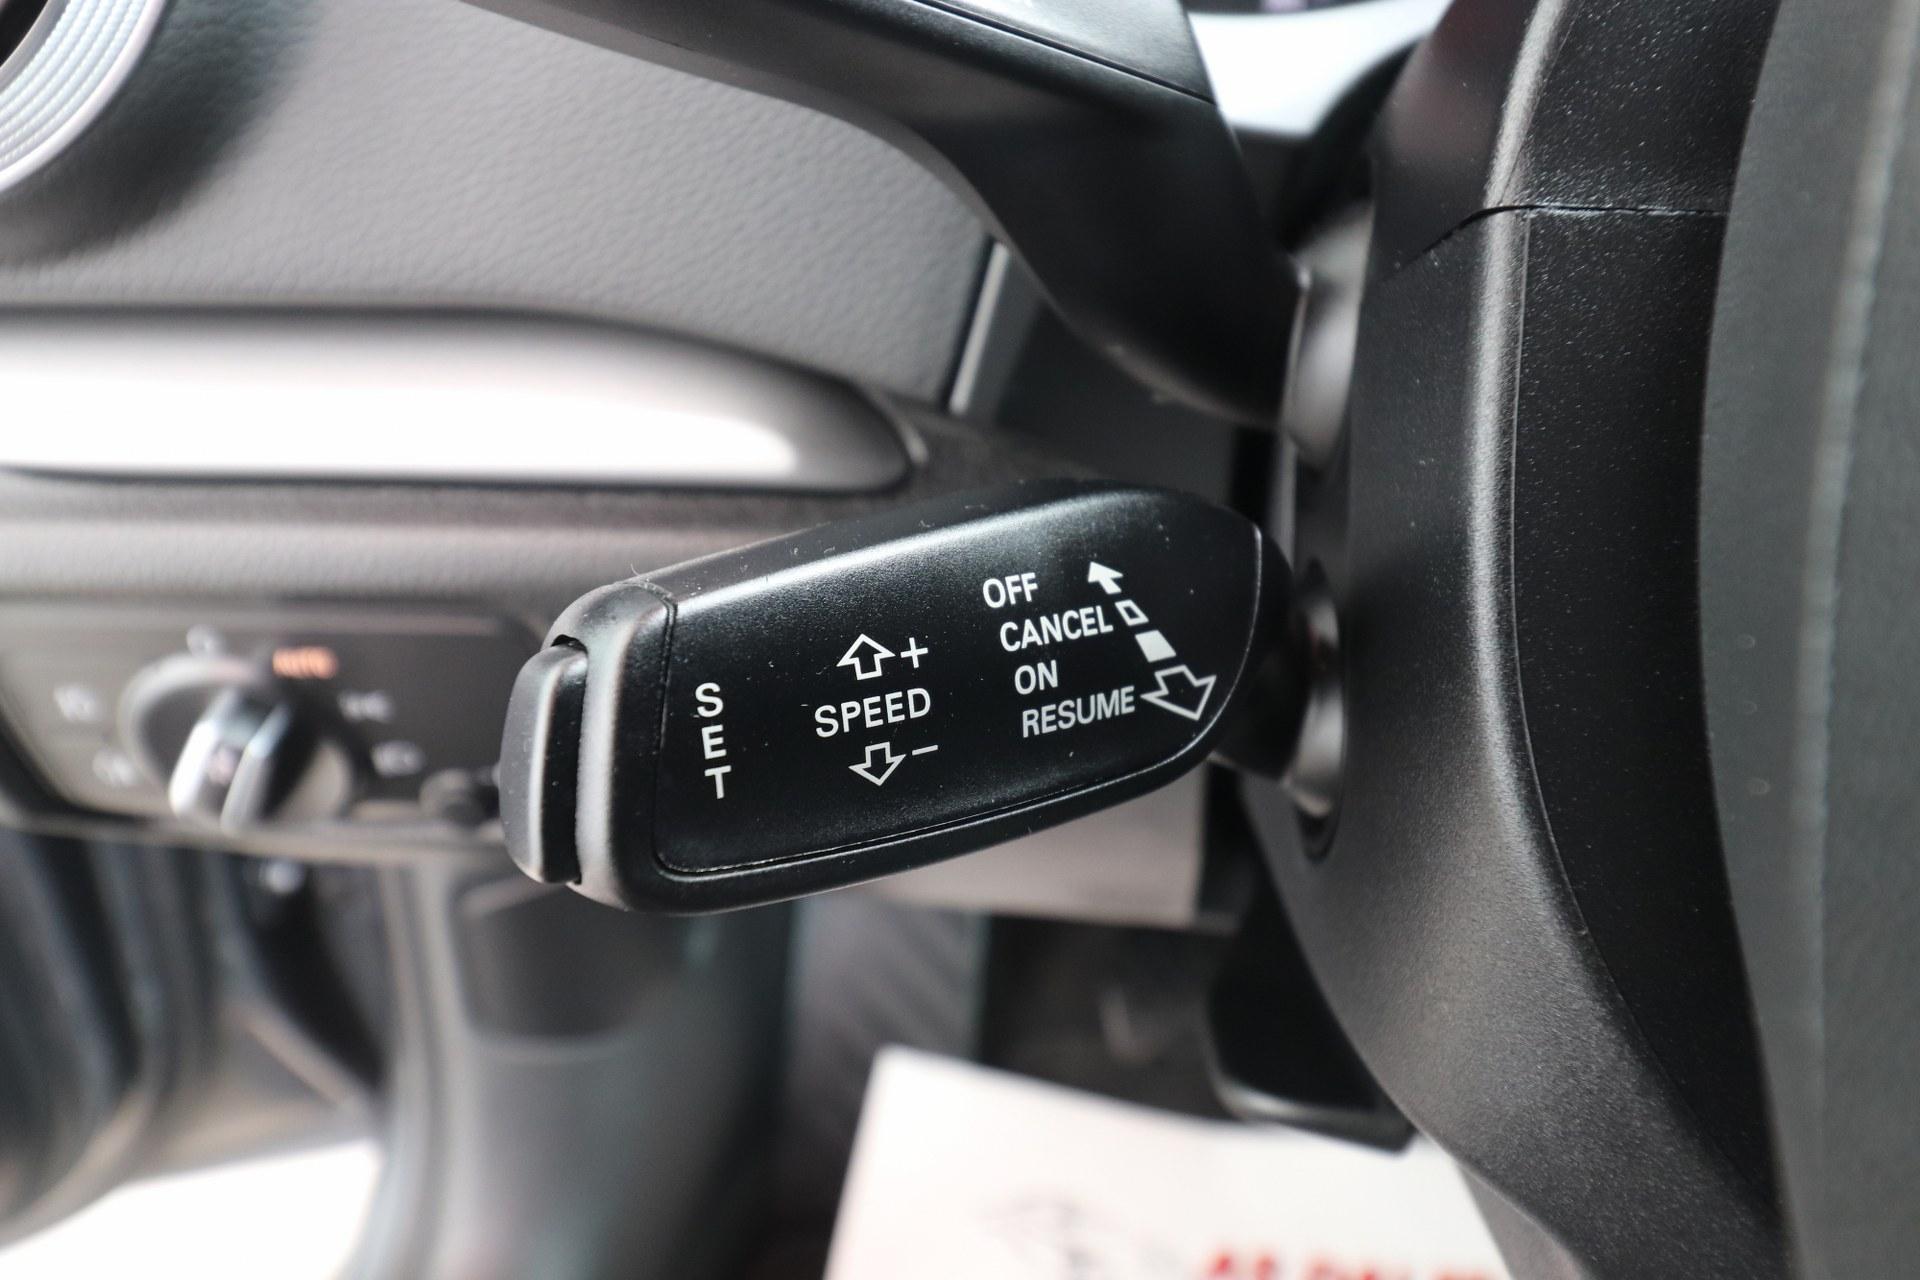 Audi A3 Limuzina 2.0 TDI 150 KS Sport Selection EXCLUSIVE PLUS S-Line Sportpaket Bi-Xenon+LED Navigacija Parktronic MAX-VOLL New Modell 2017